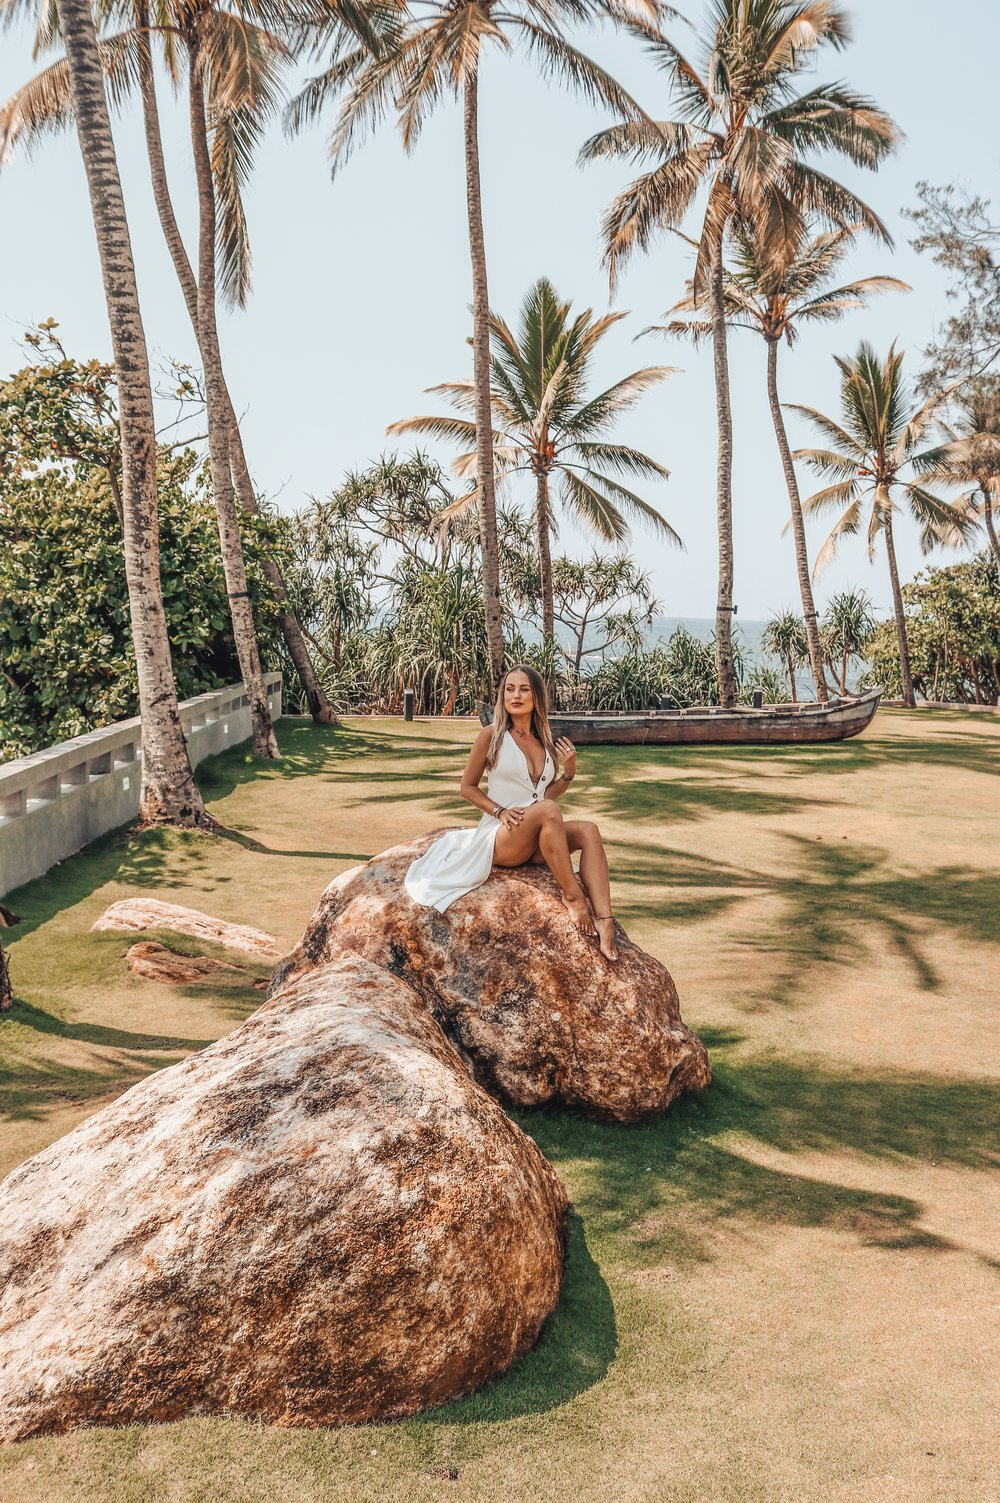 Sri-lanka-hotels.jpg